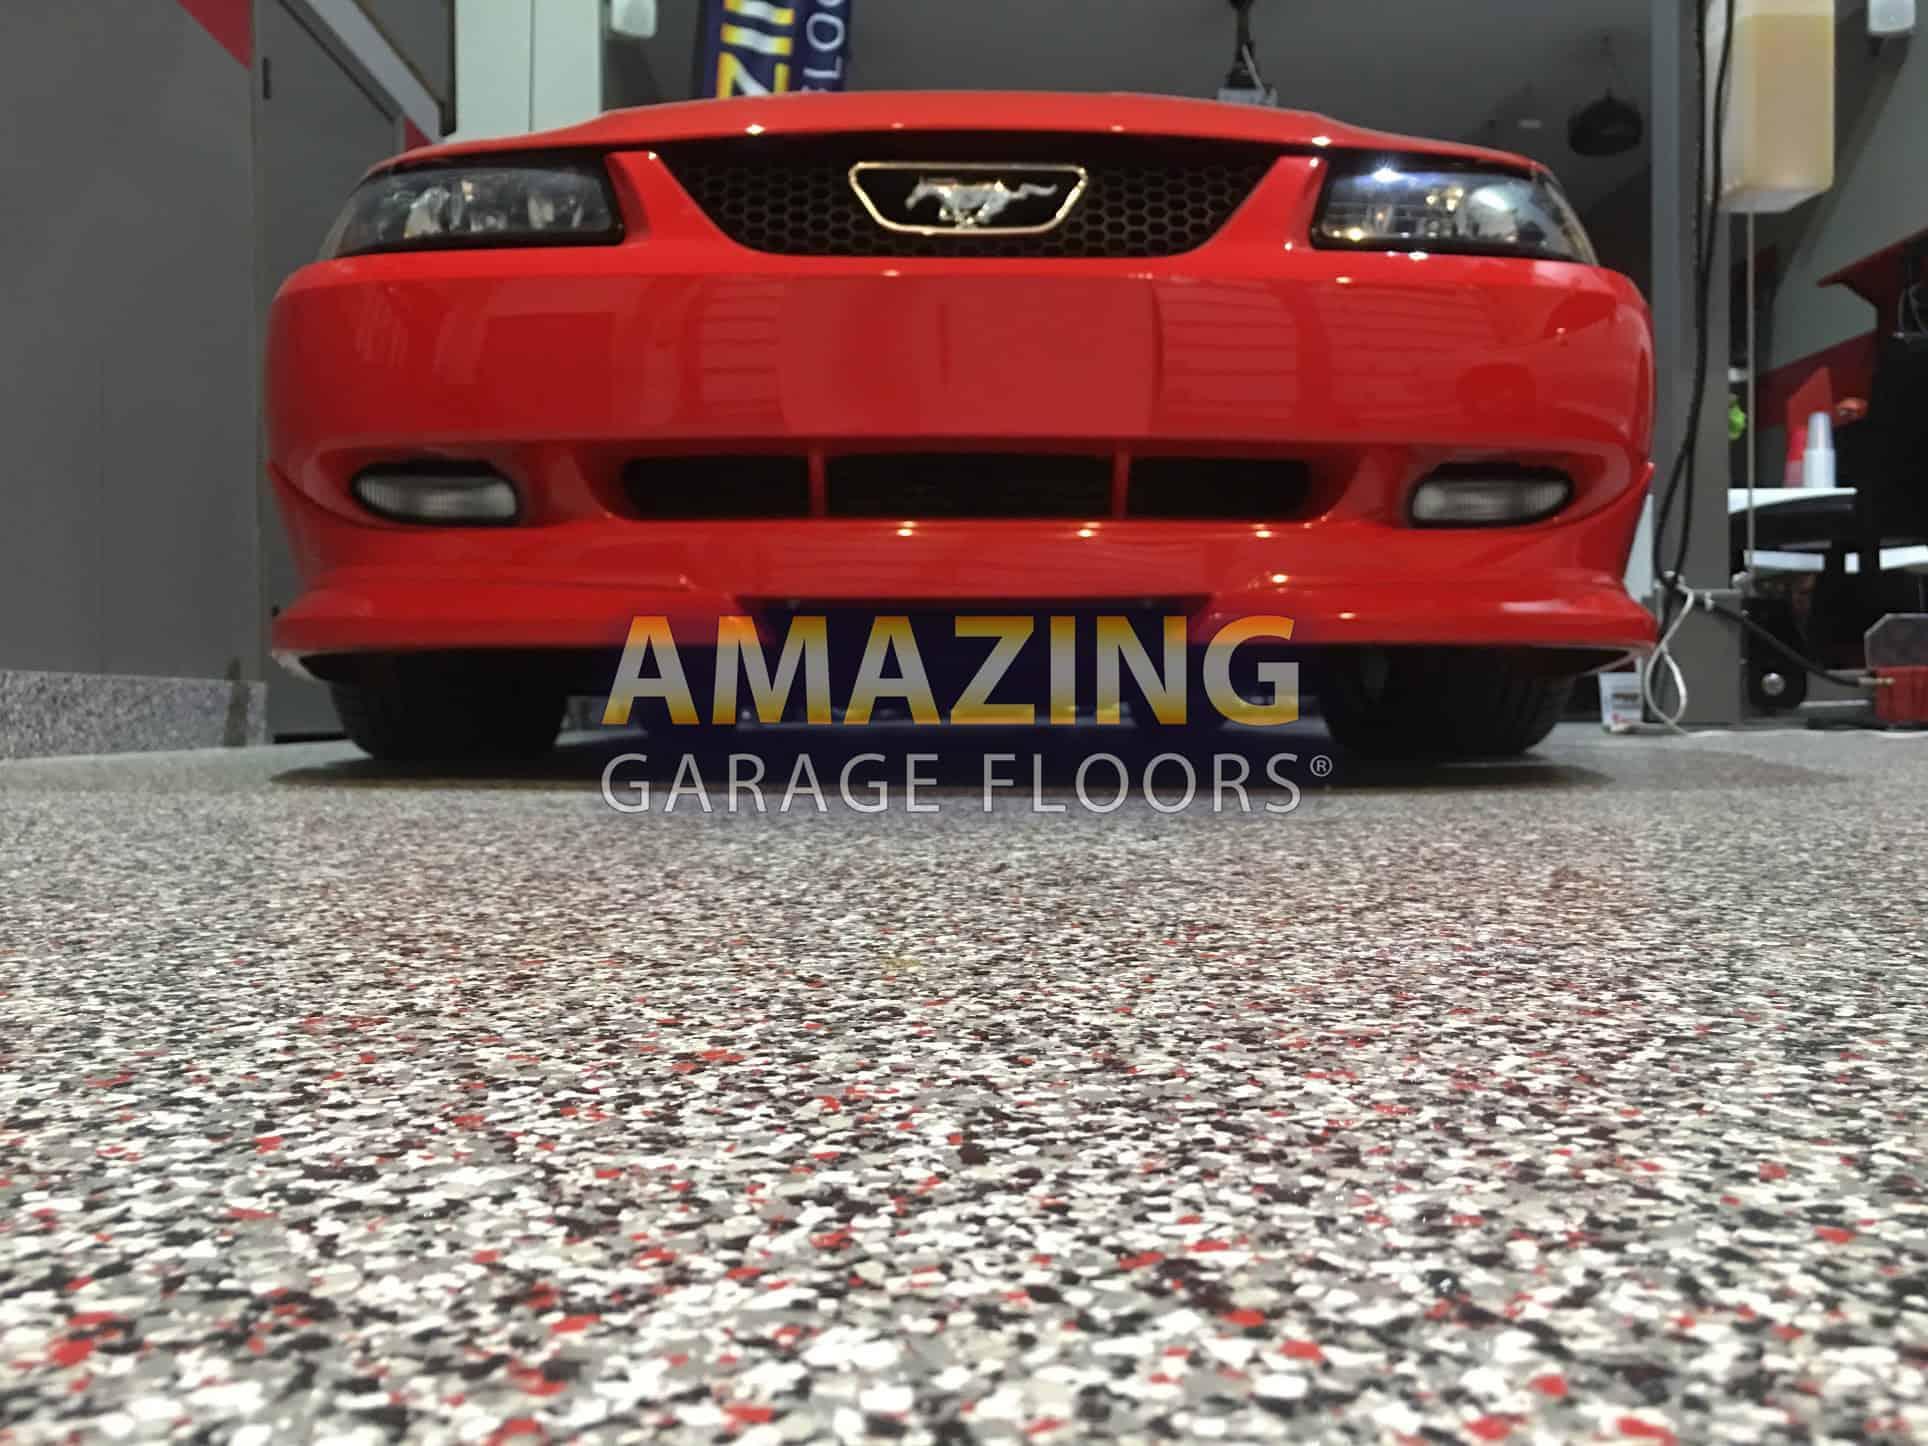 Amazing Garage Floors commercial floor finish